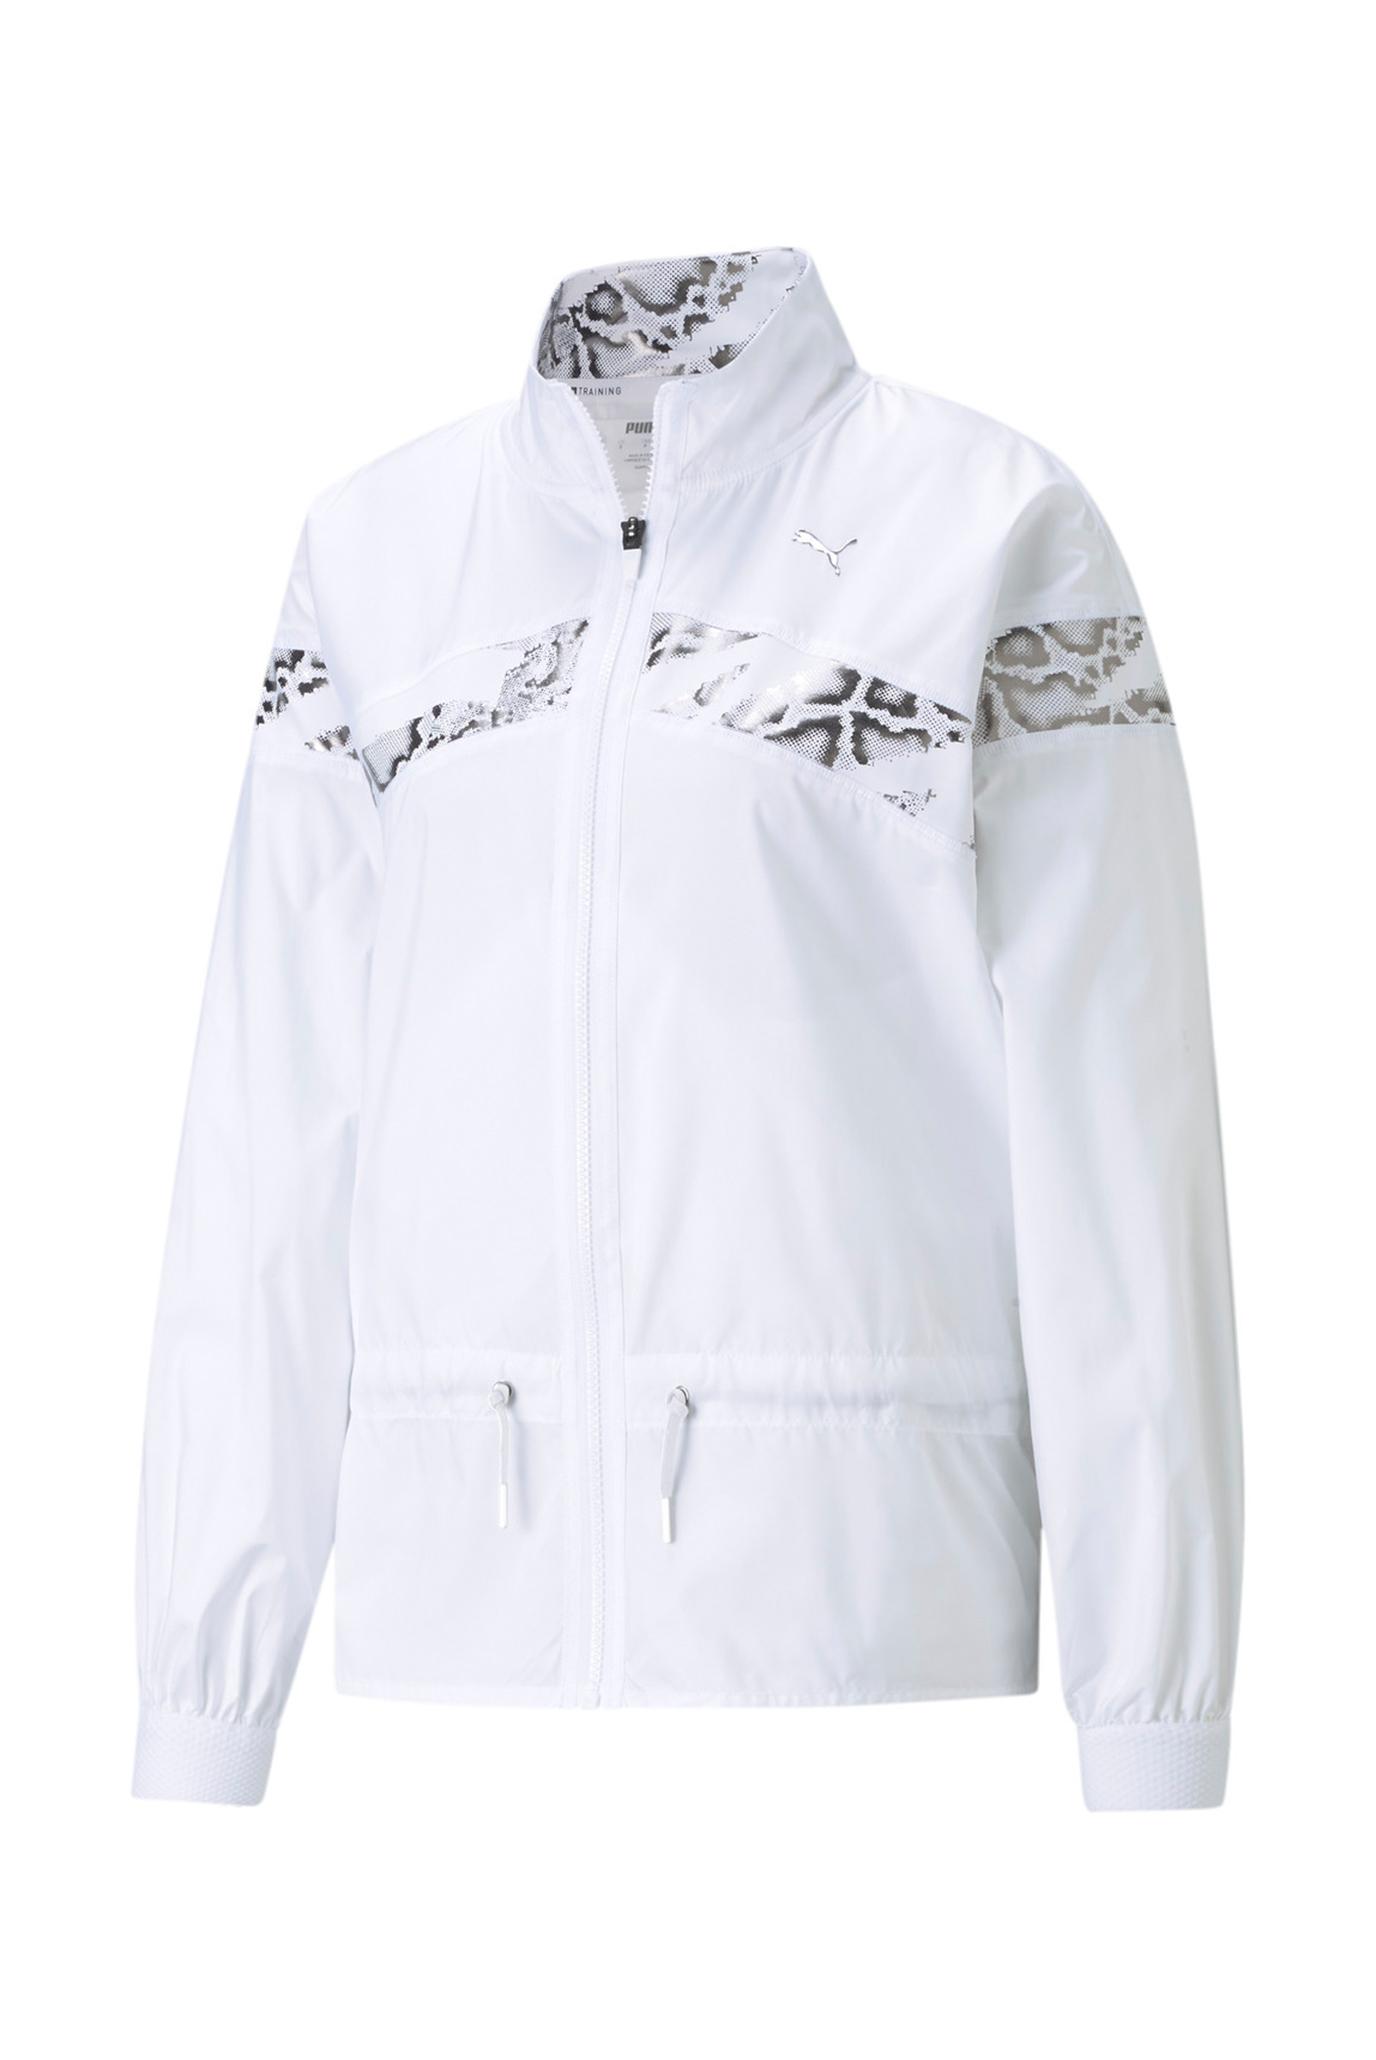 Жіноча біла куртка UNTMD Woven Women's Training Jacket 1